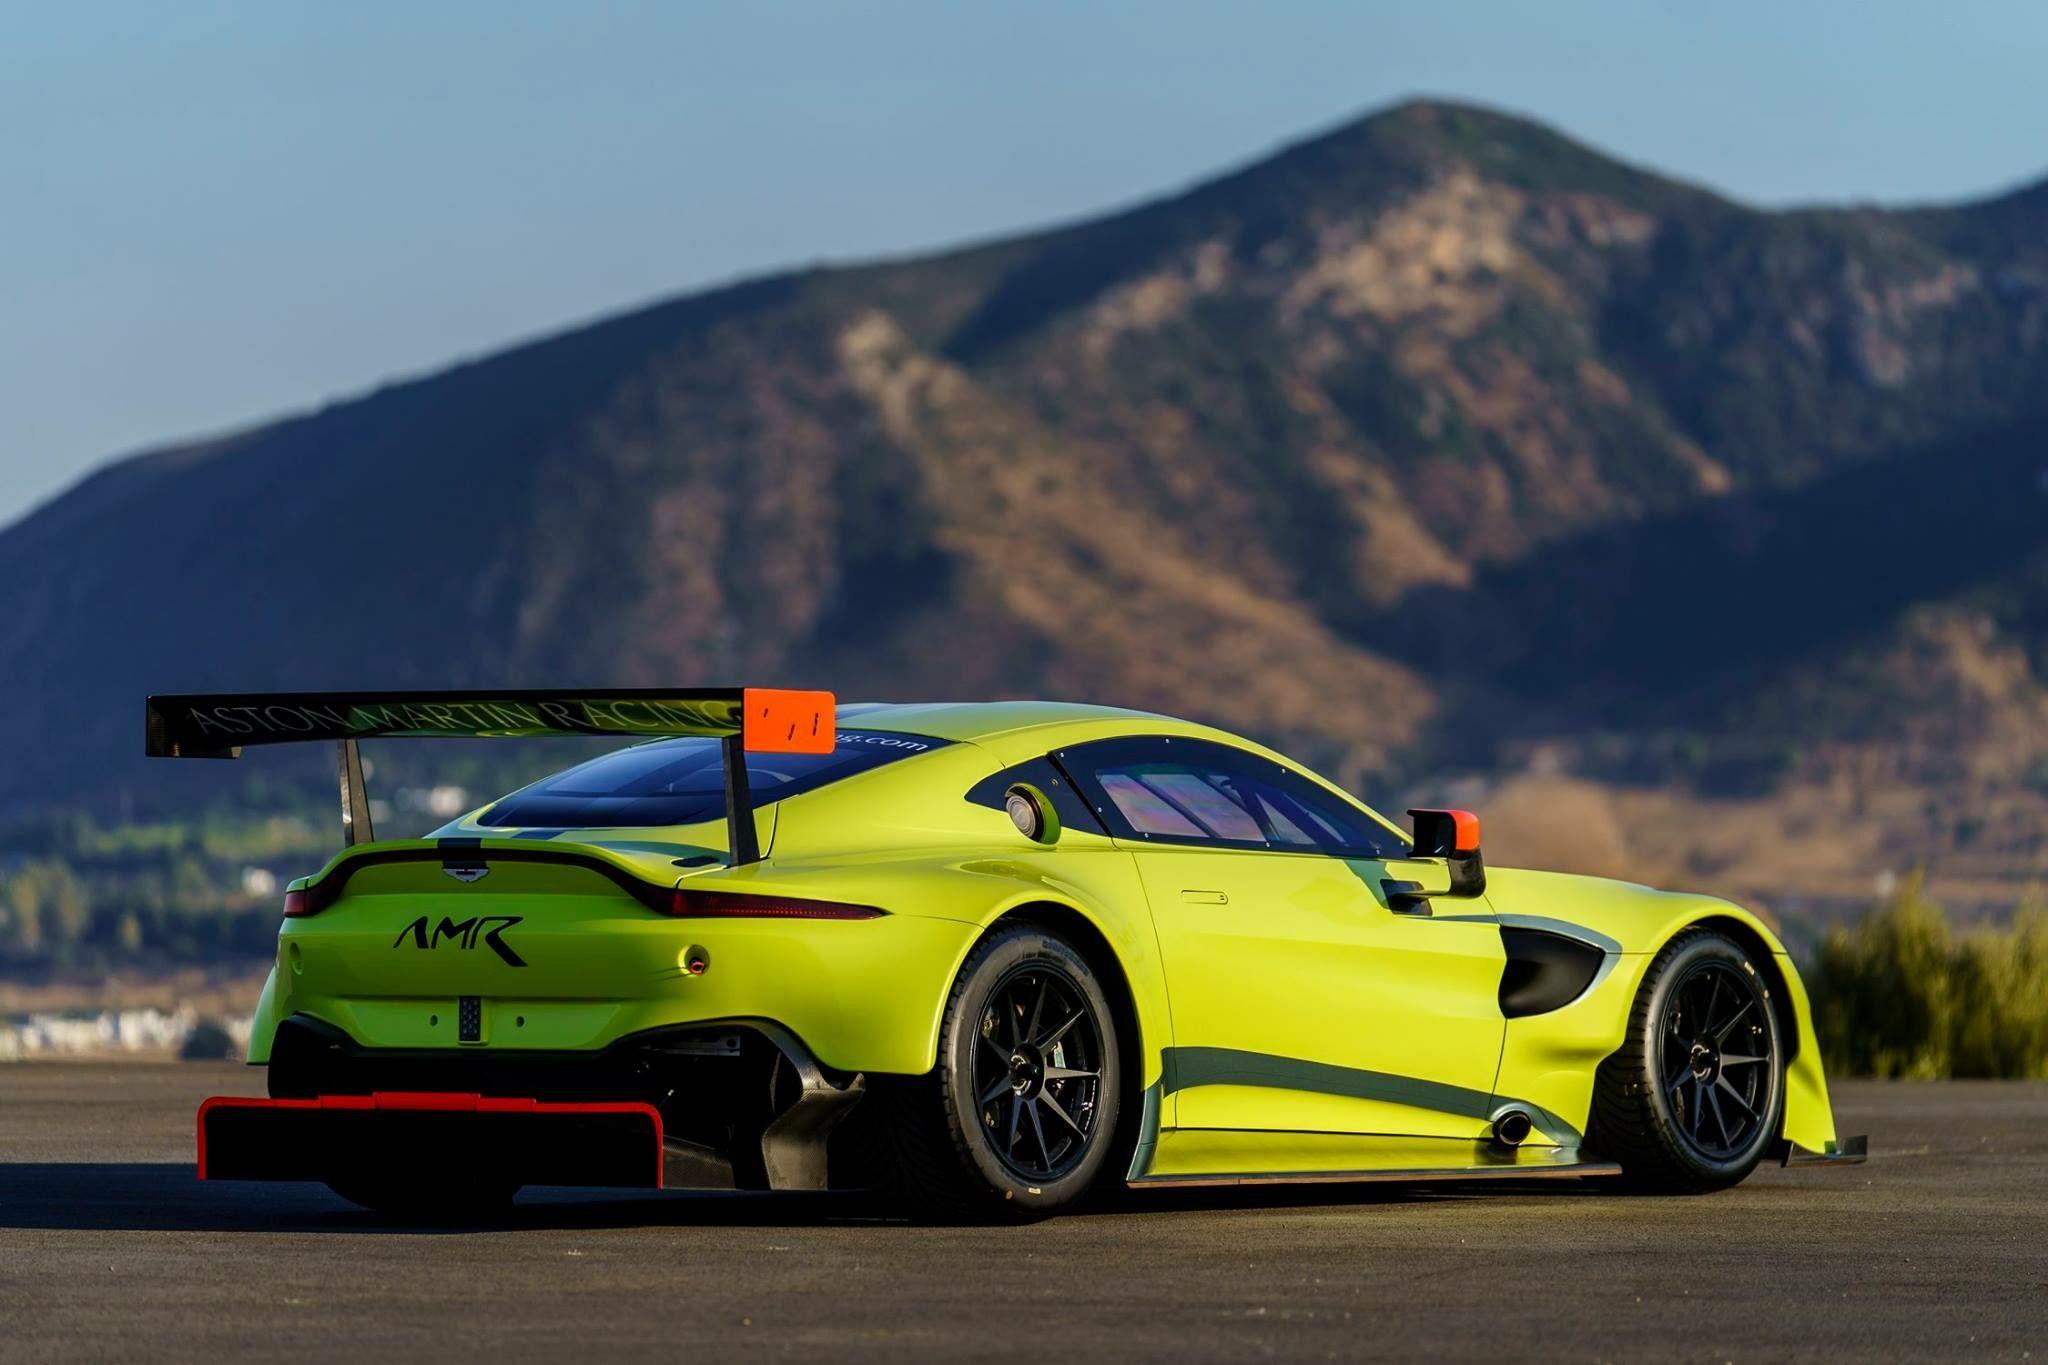 2018 And 2019 New Aston Martin Vantage Gte Wec And Le Mans New Racer Carros Aston Martin Aston Martin Vantage Aston Martin